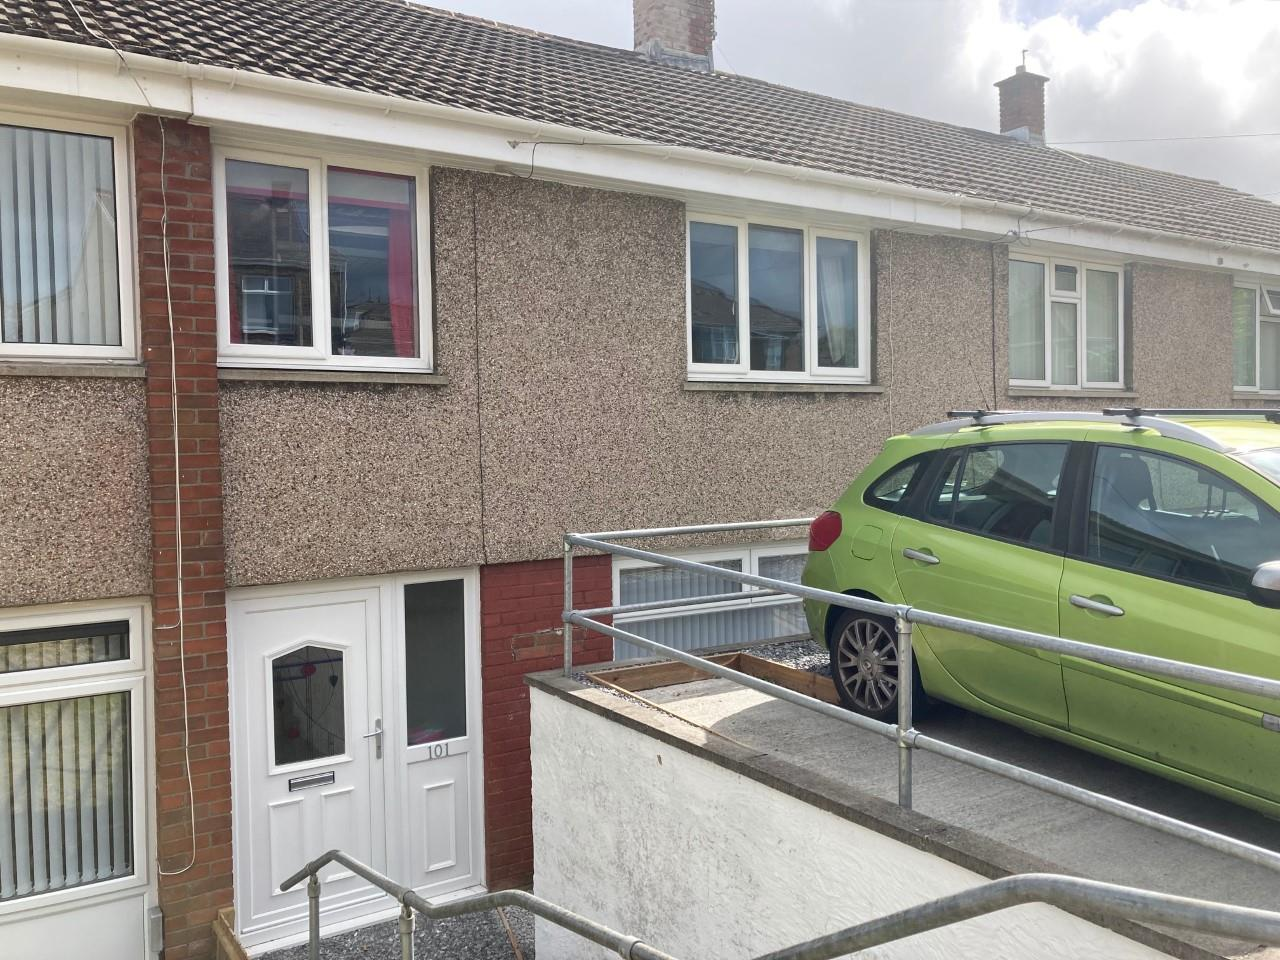 Llanllienwen Road, Cwmrhydyceirw, Swansea, SA6 6LU